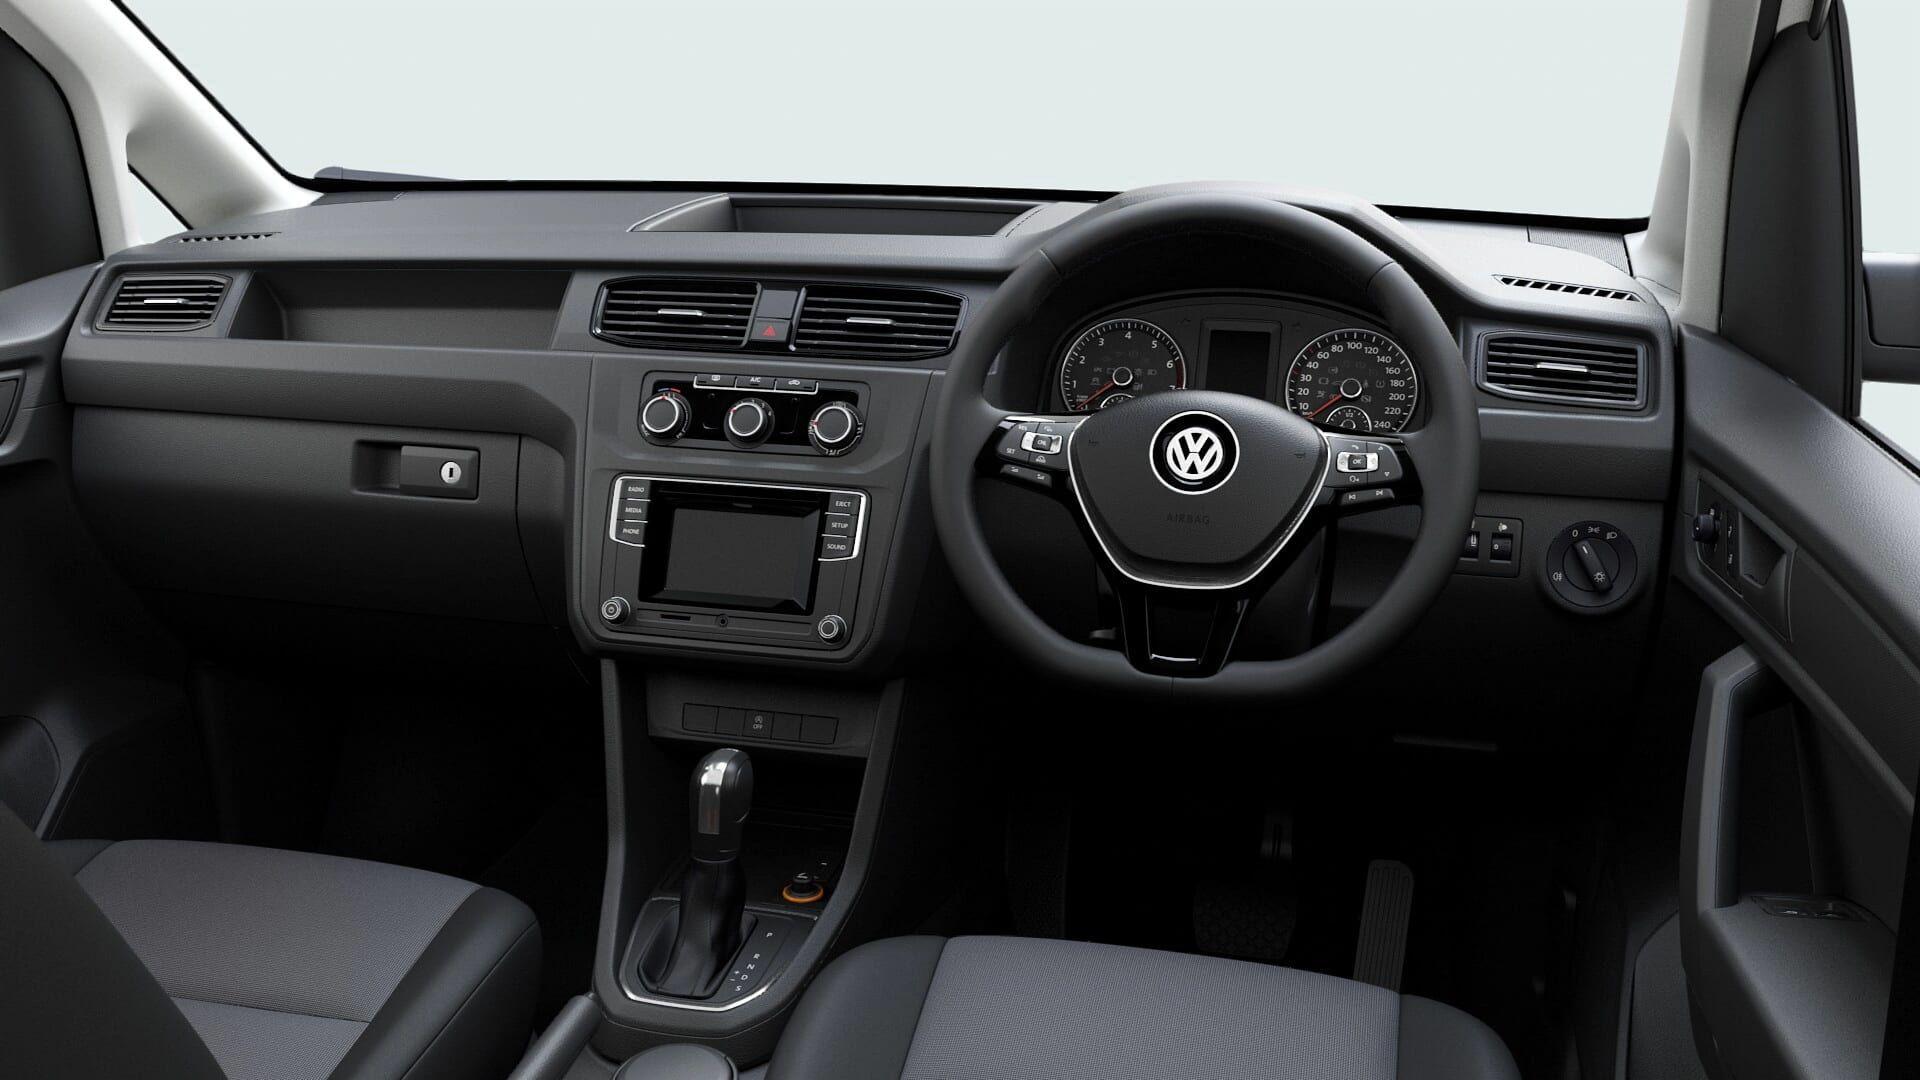 Interior Car View